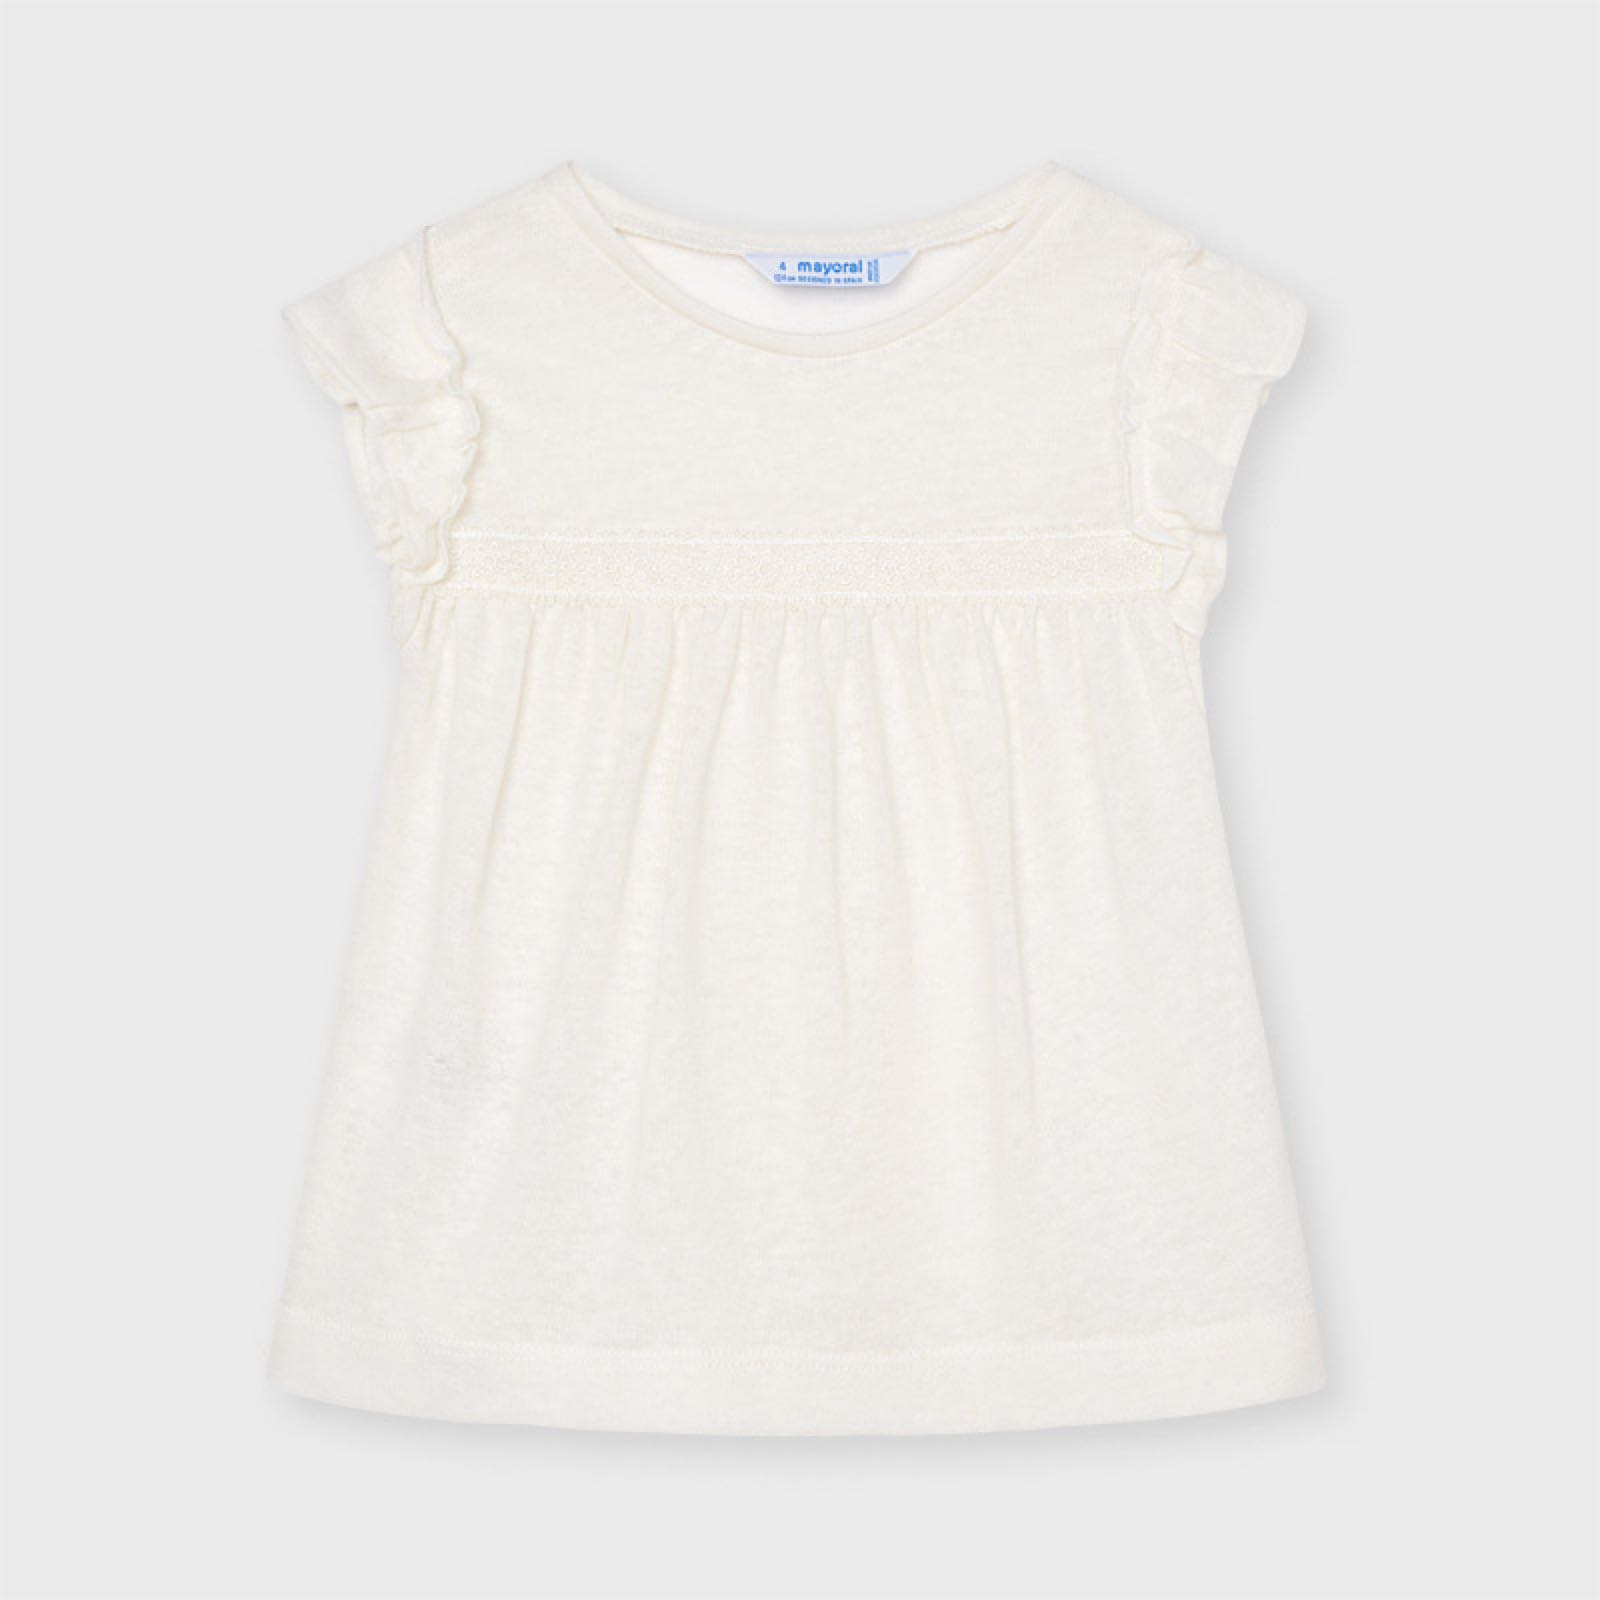 MAYORAL GIRLS Short sleeved linen t-shirt 3006-32